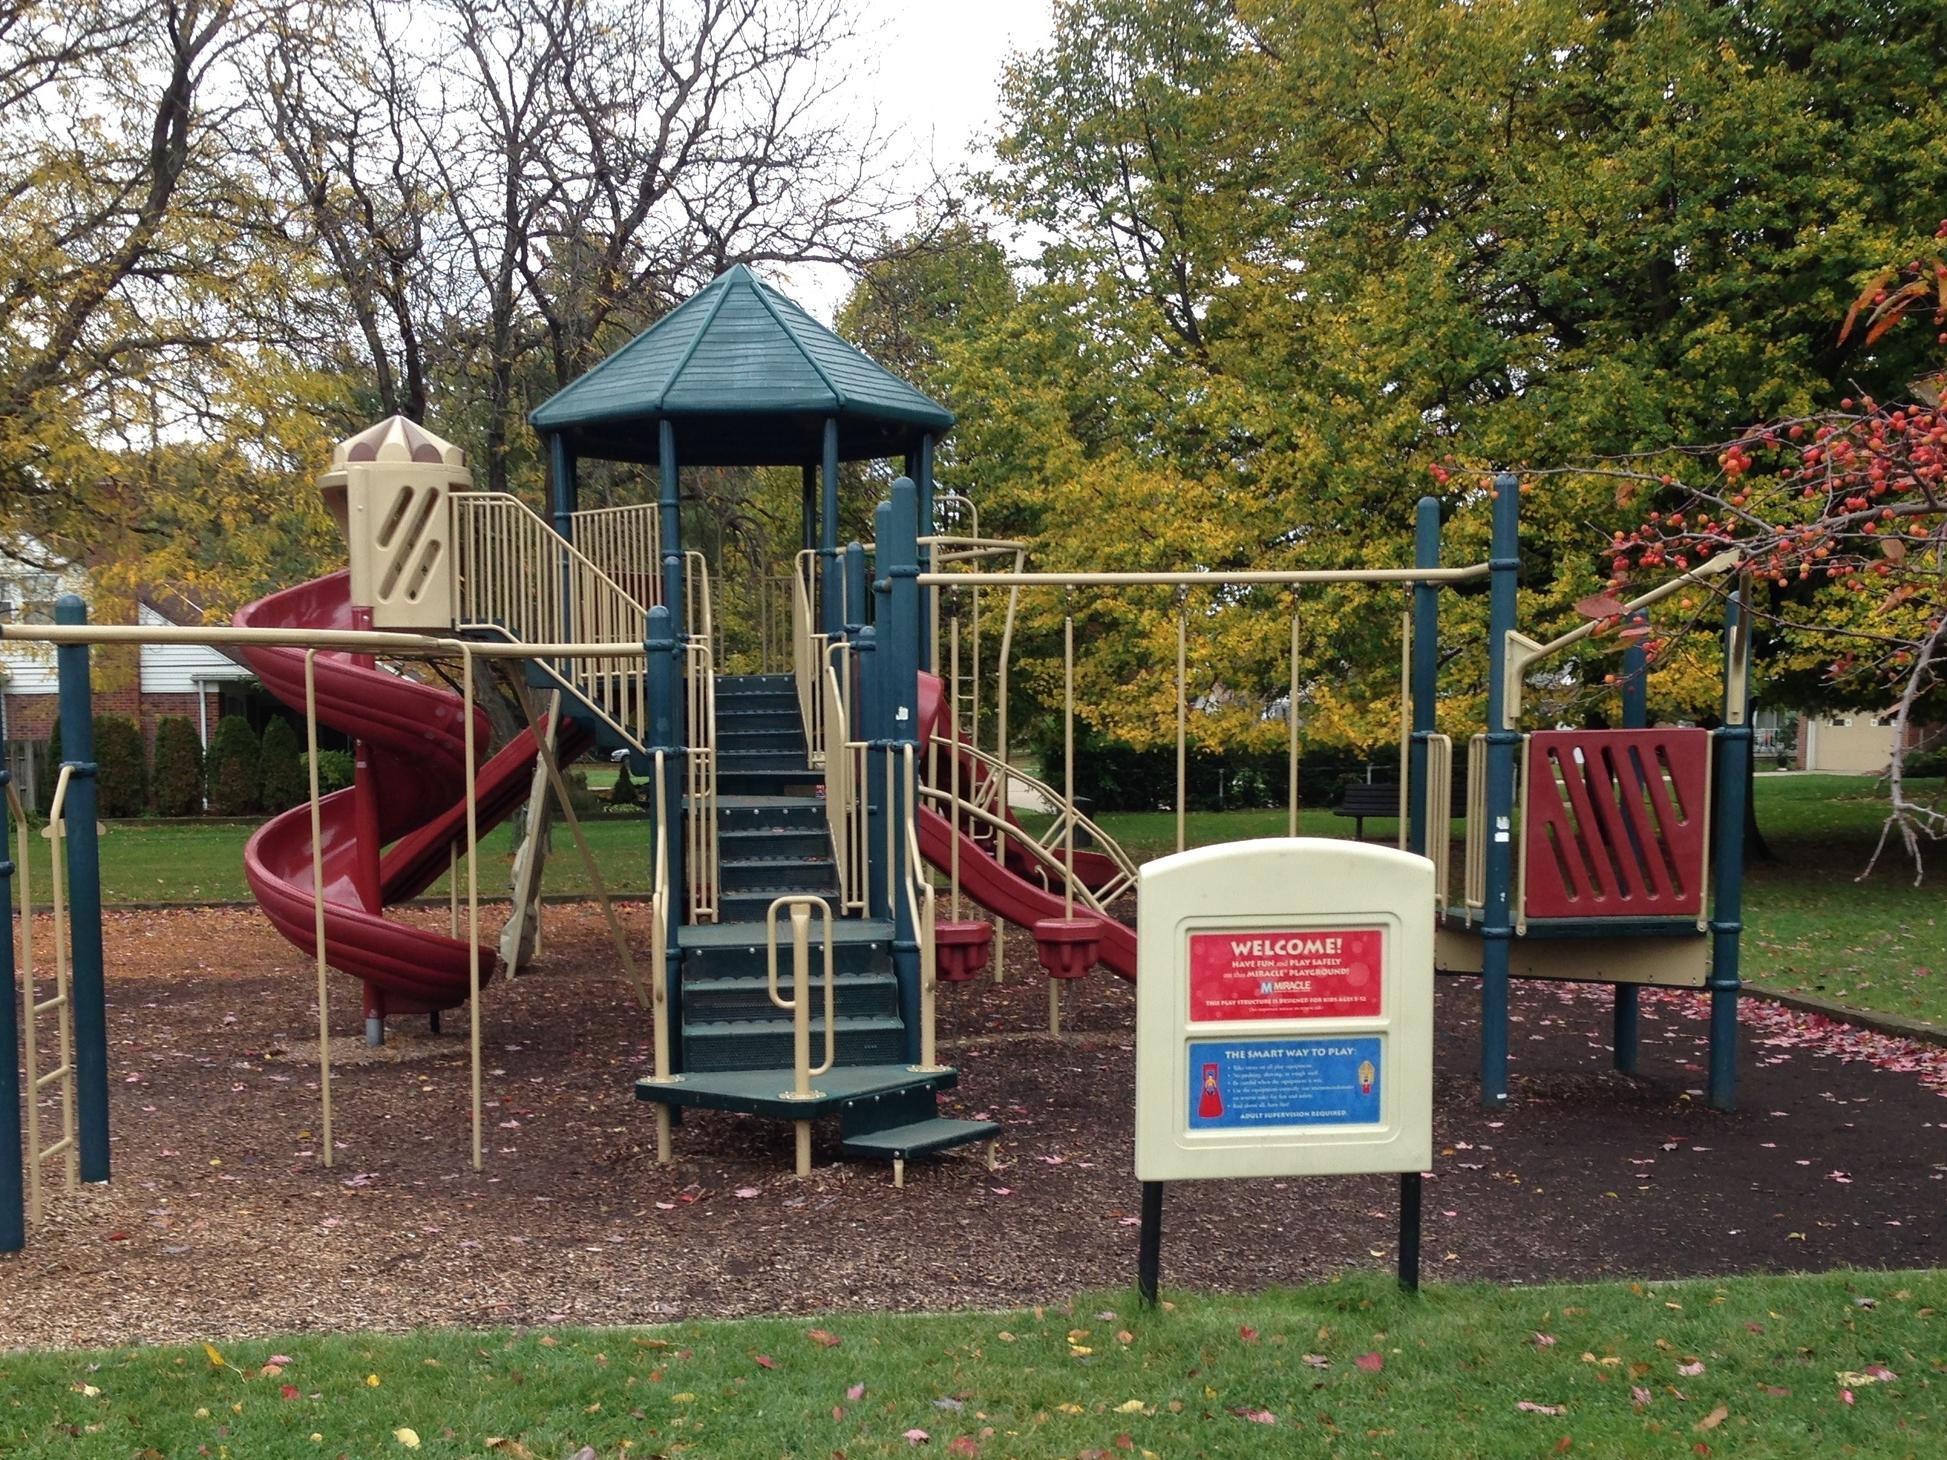 Play ground equipment at Martin's Park